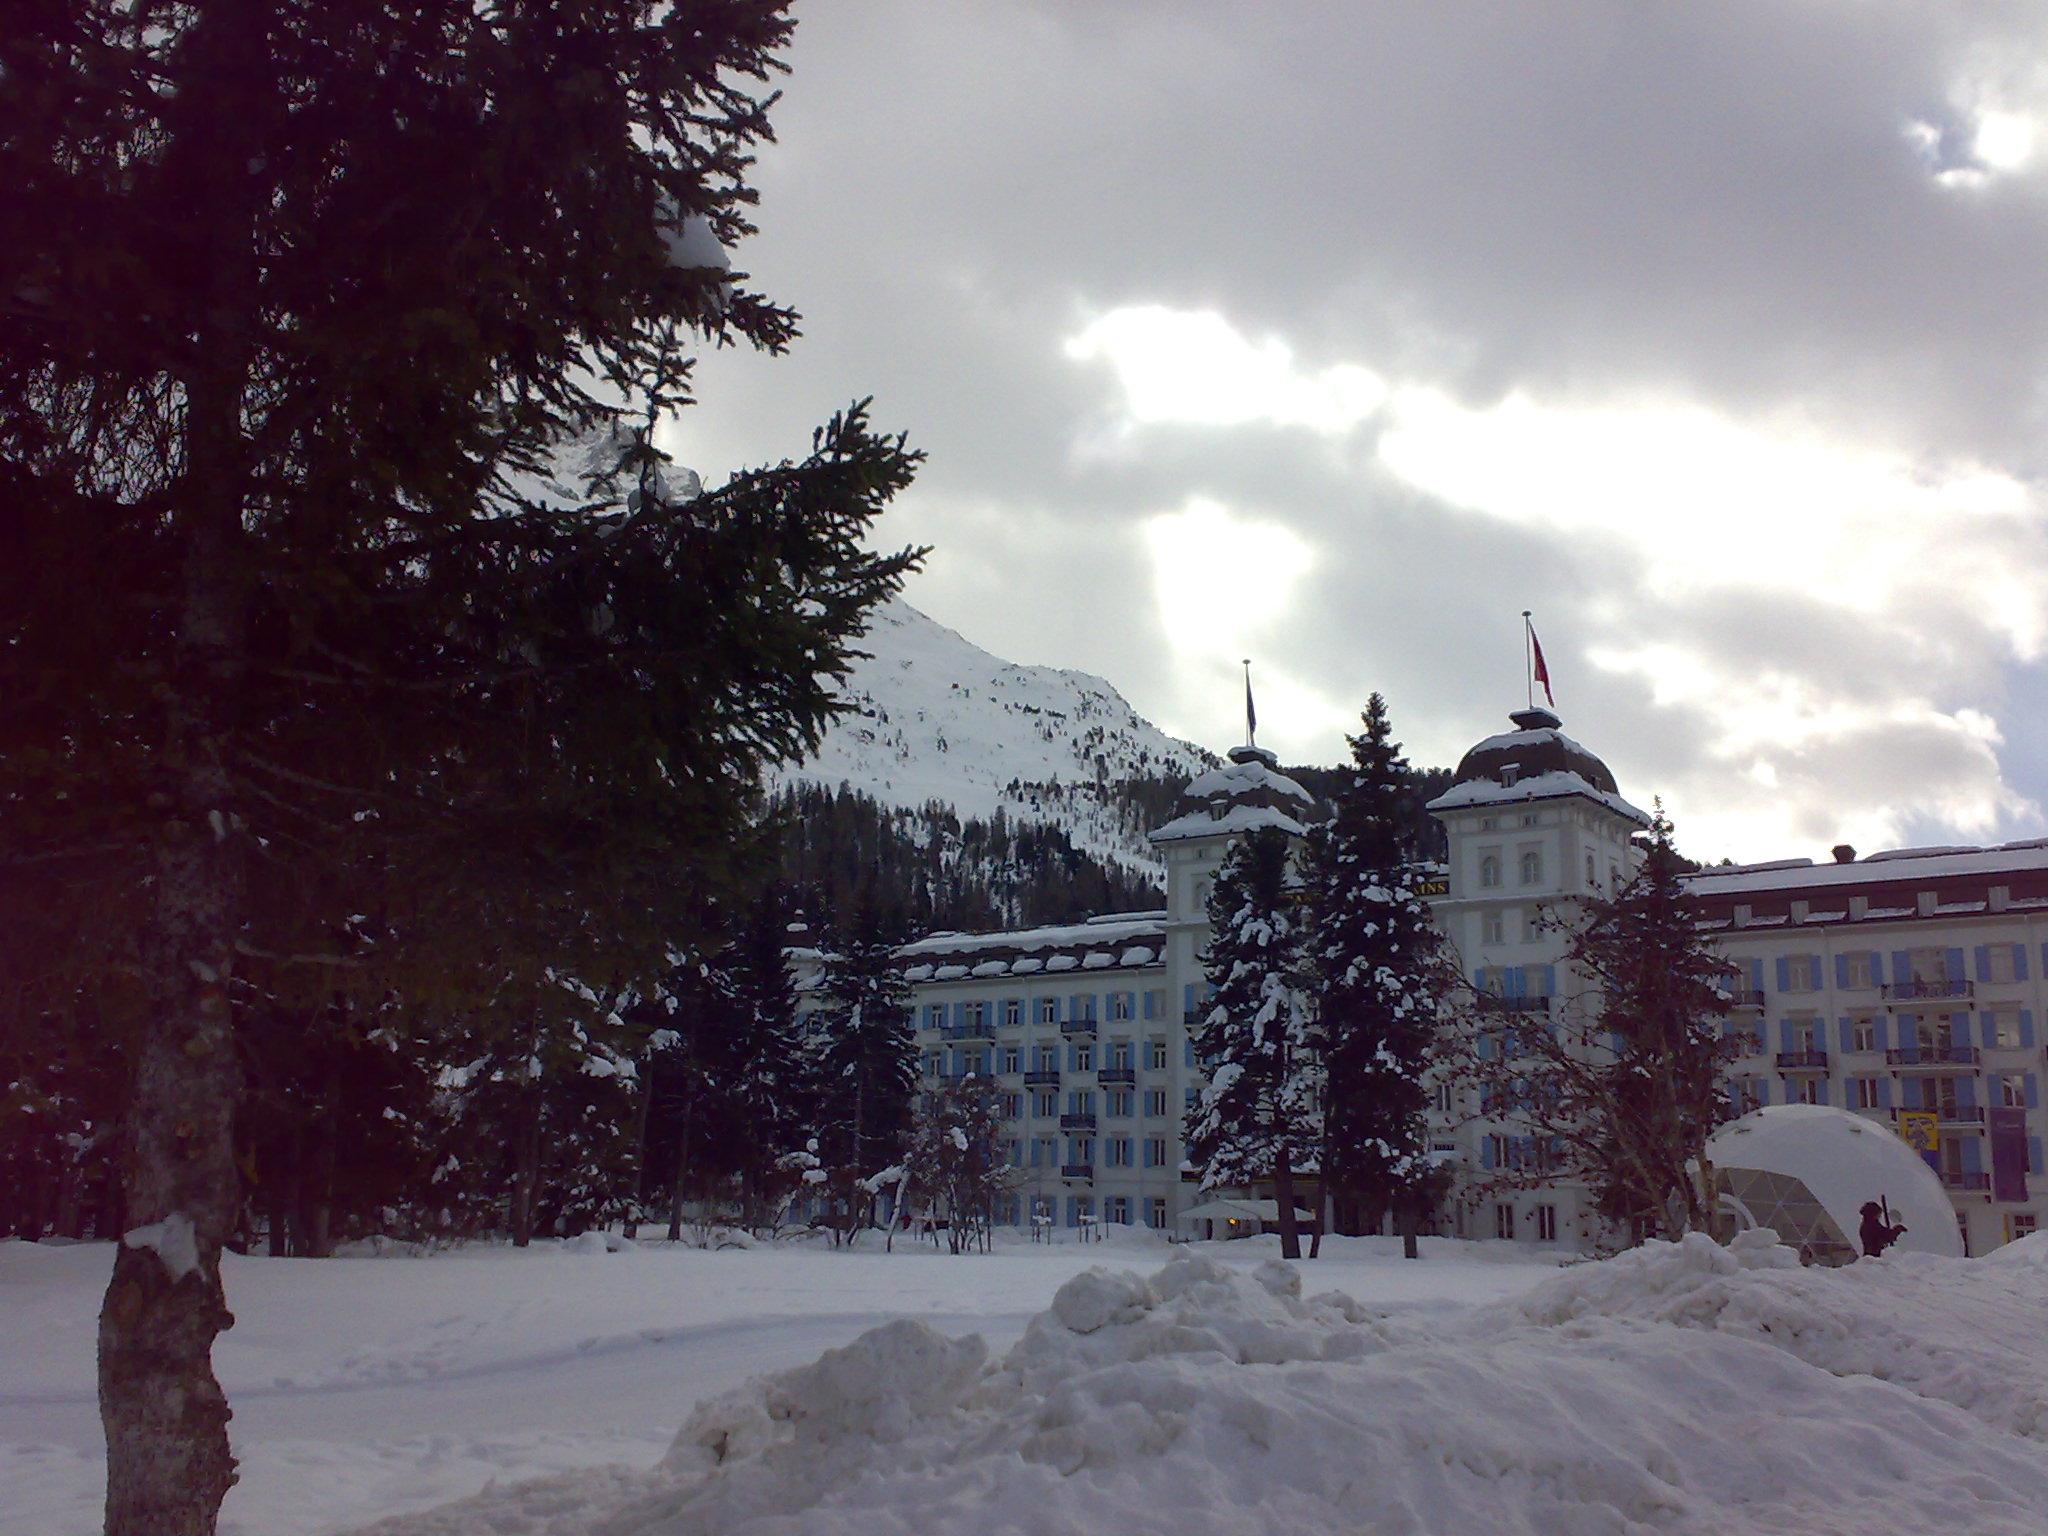 St. Moritz - Kempinski Hotel